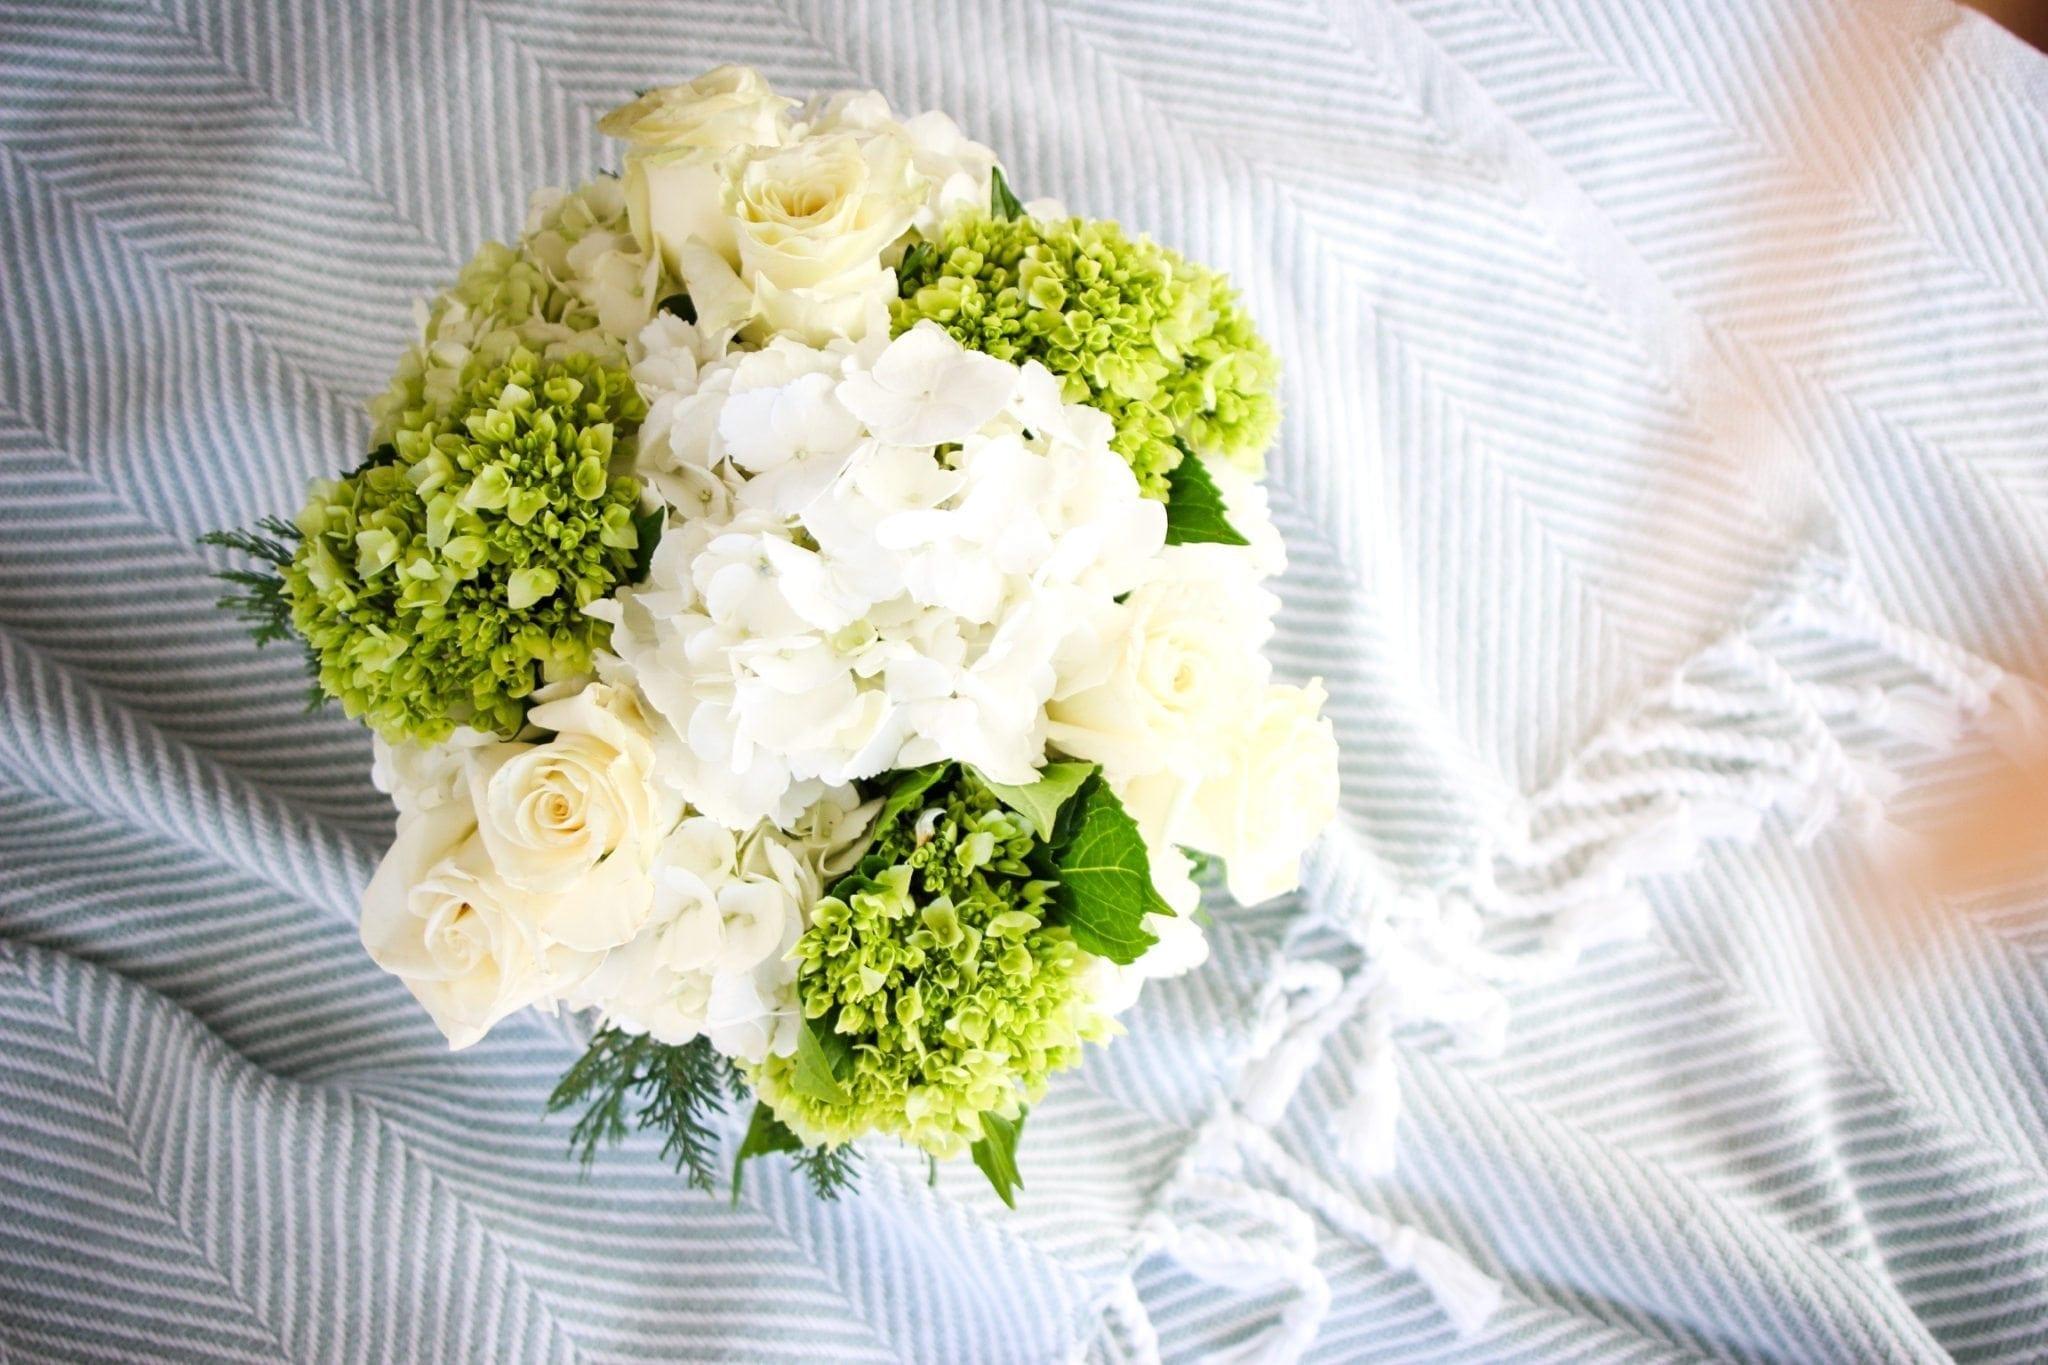 White and green hydrangea flower bouquet.